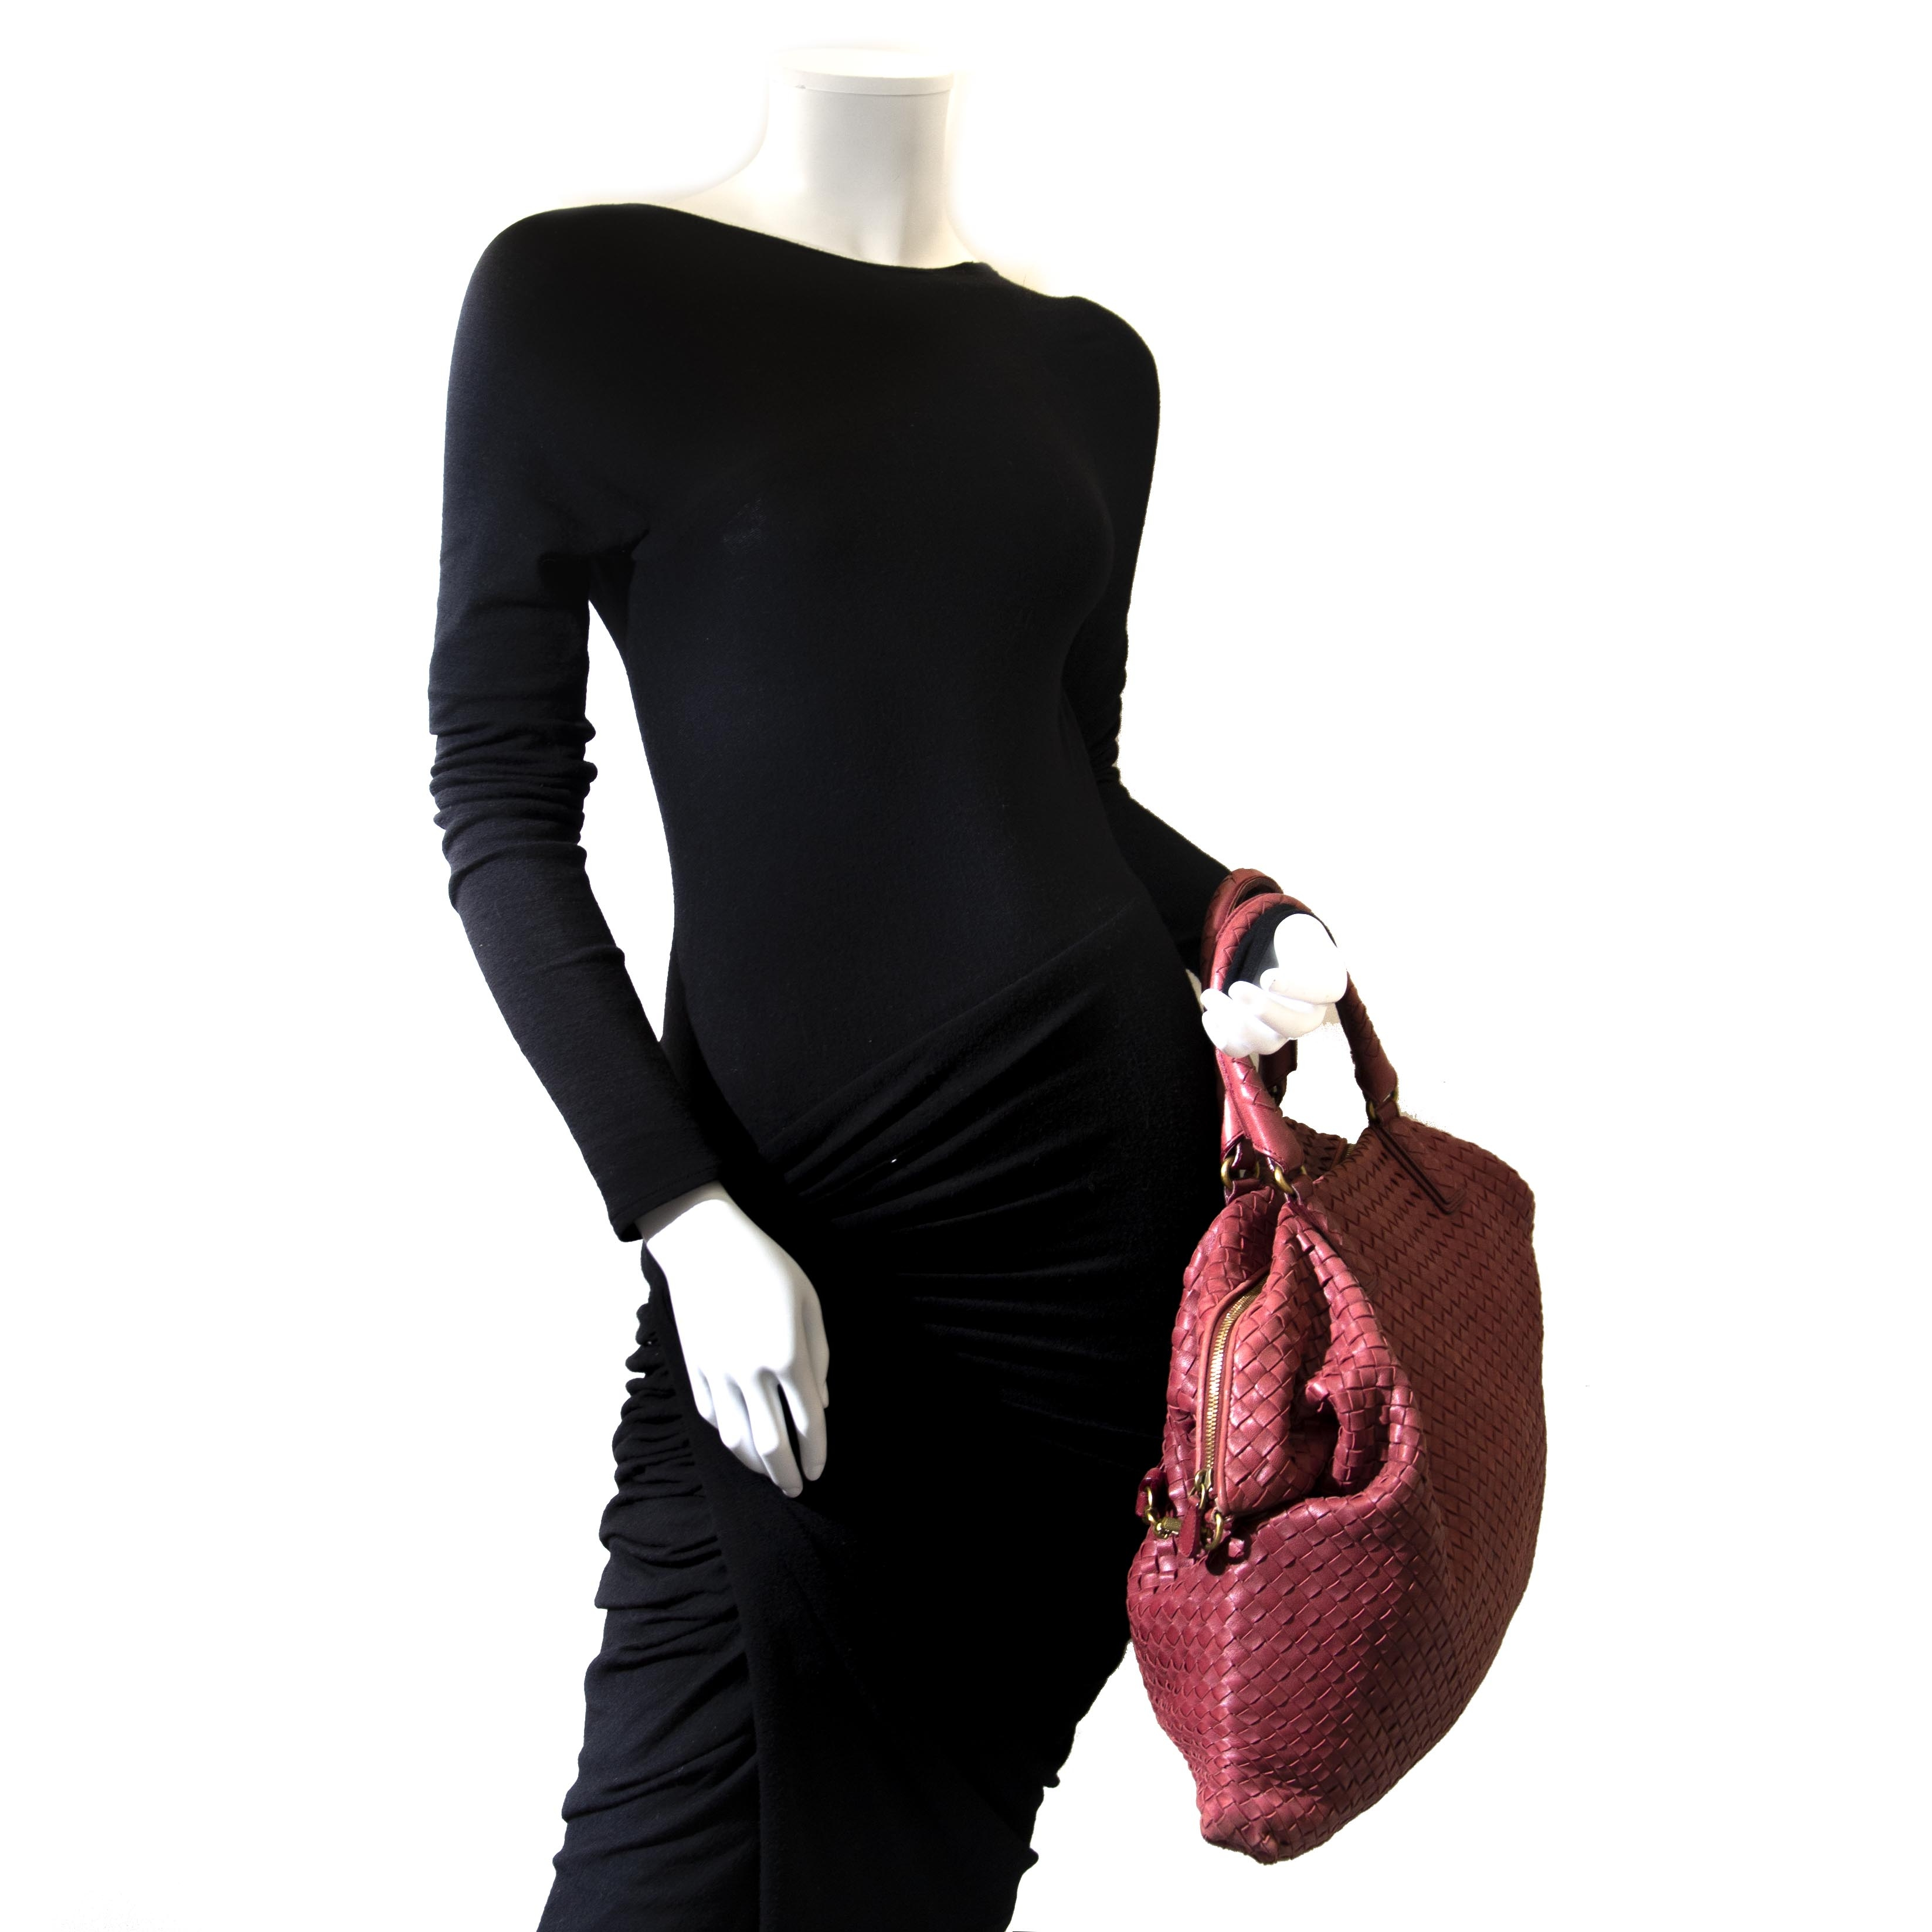 Vintage Bottega Venetta Red Terracotta Leather Tote at Labellov.